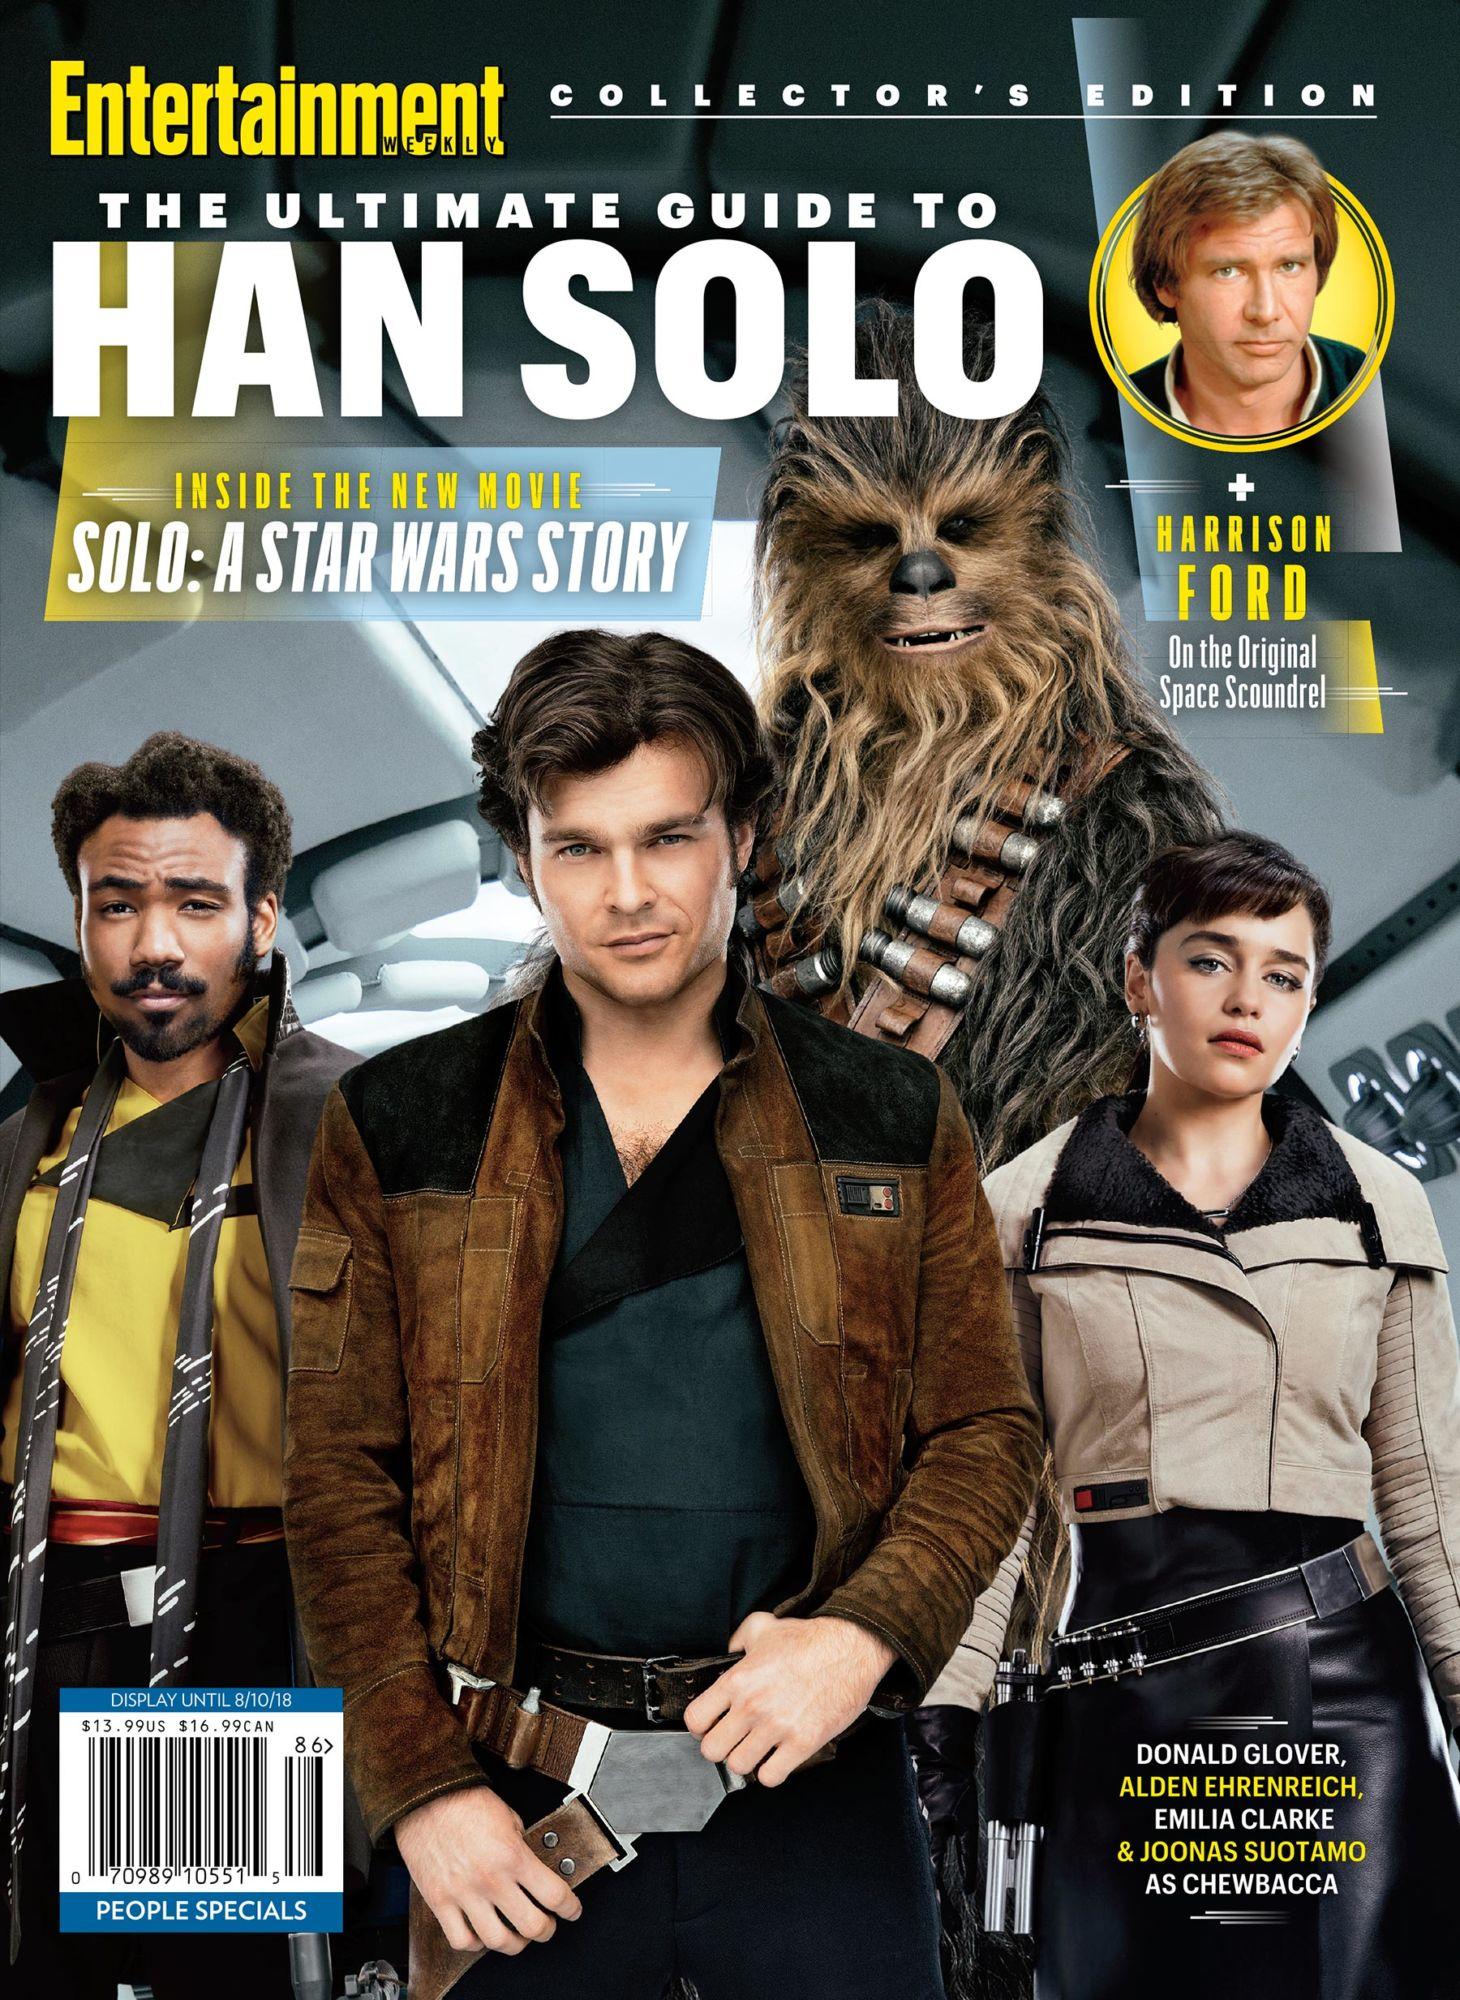 Solo: Star Wars 8 - 2018 film 79